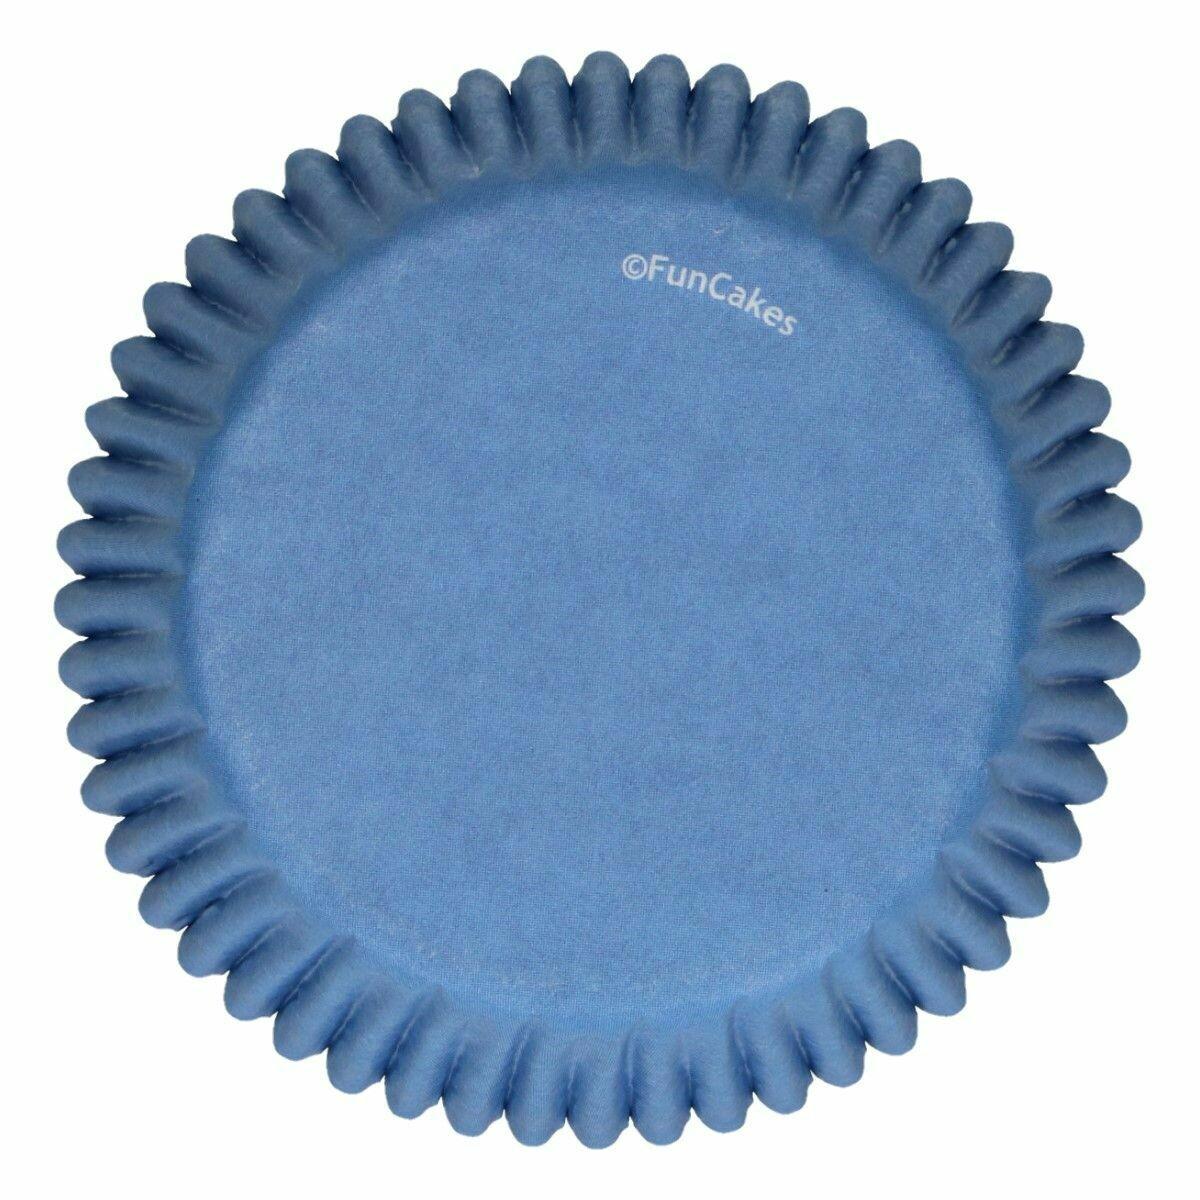 FunCakes Cupcake Cases -ROYAL BLUE -Θήκες Ψησίματος -Μπλε Βασιλικού -48 τεμ